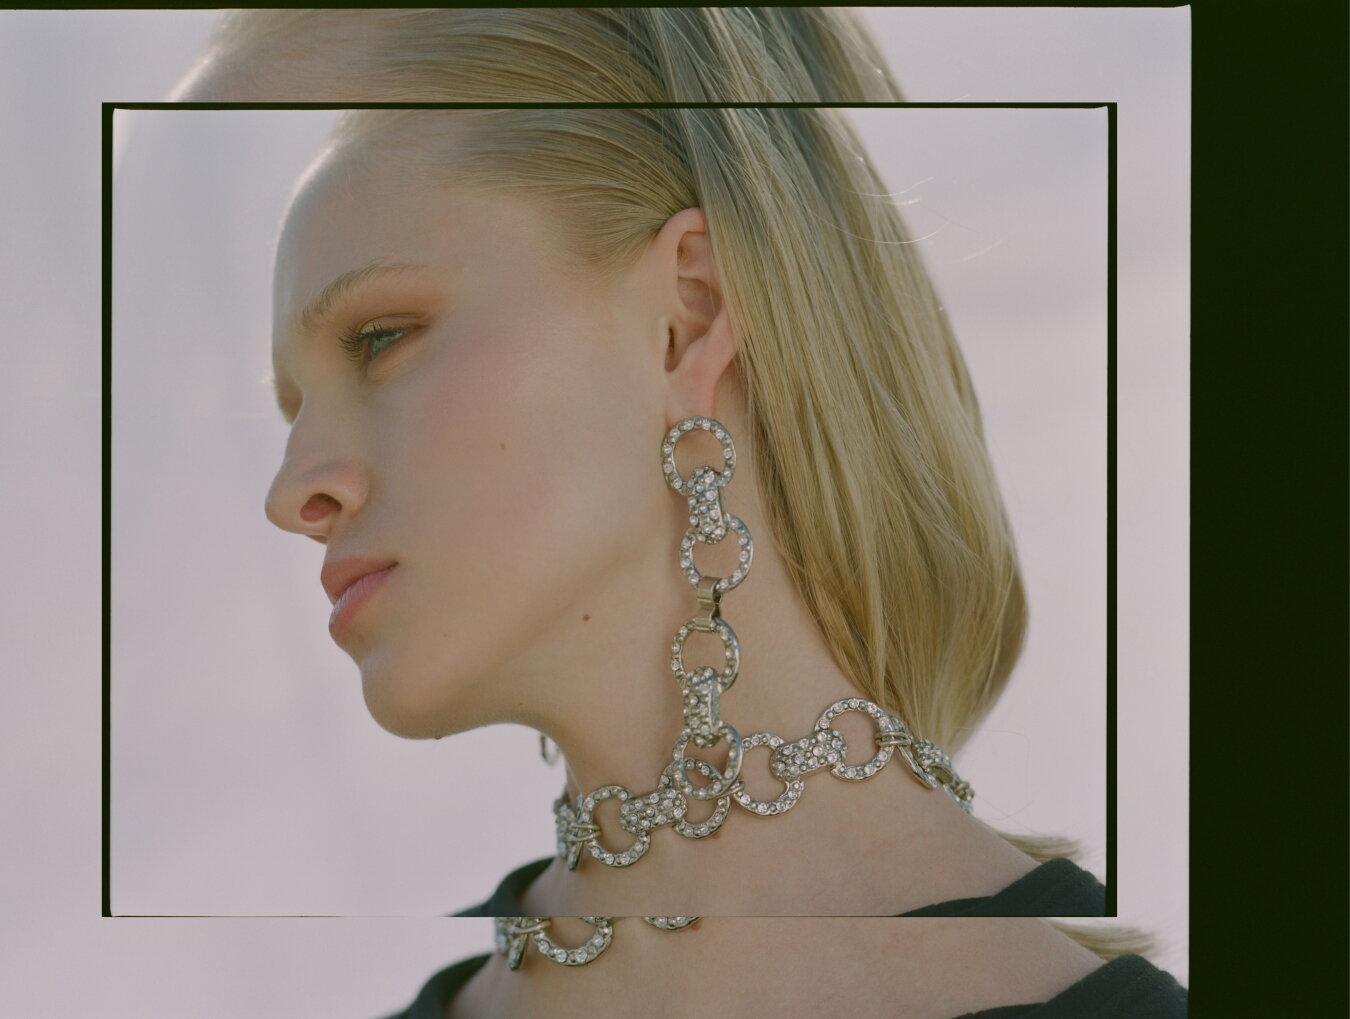 Balyck Earrings & Choker